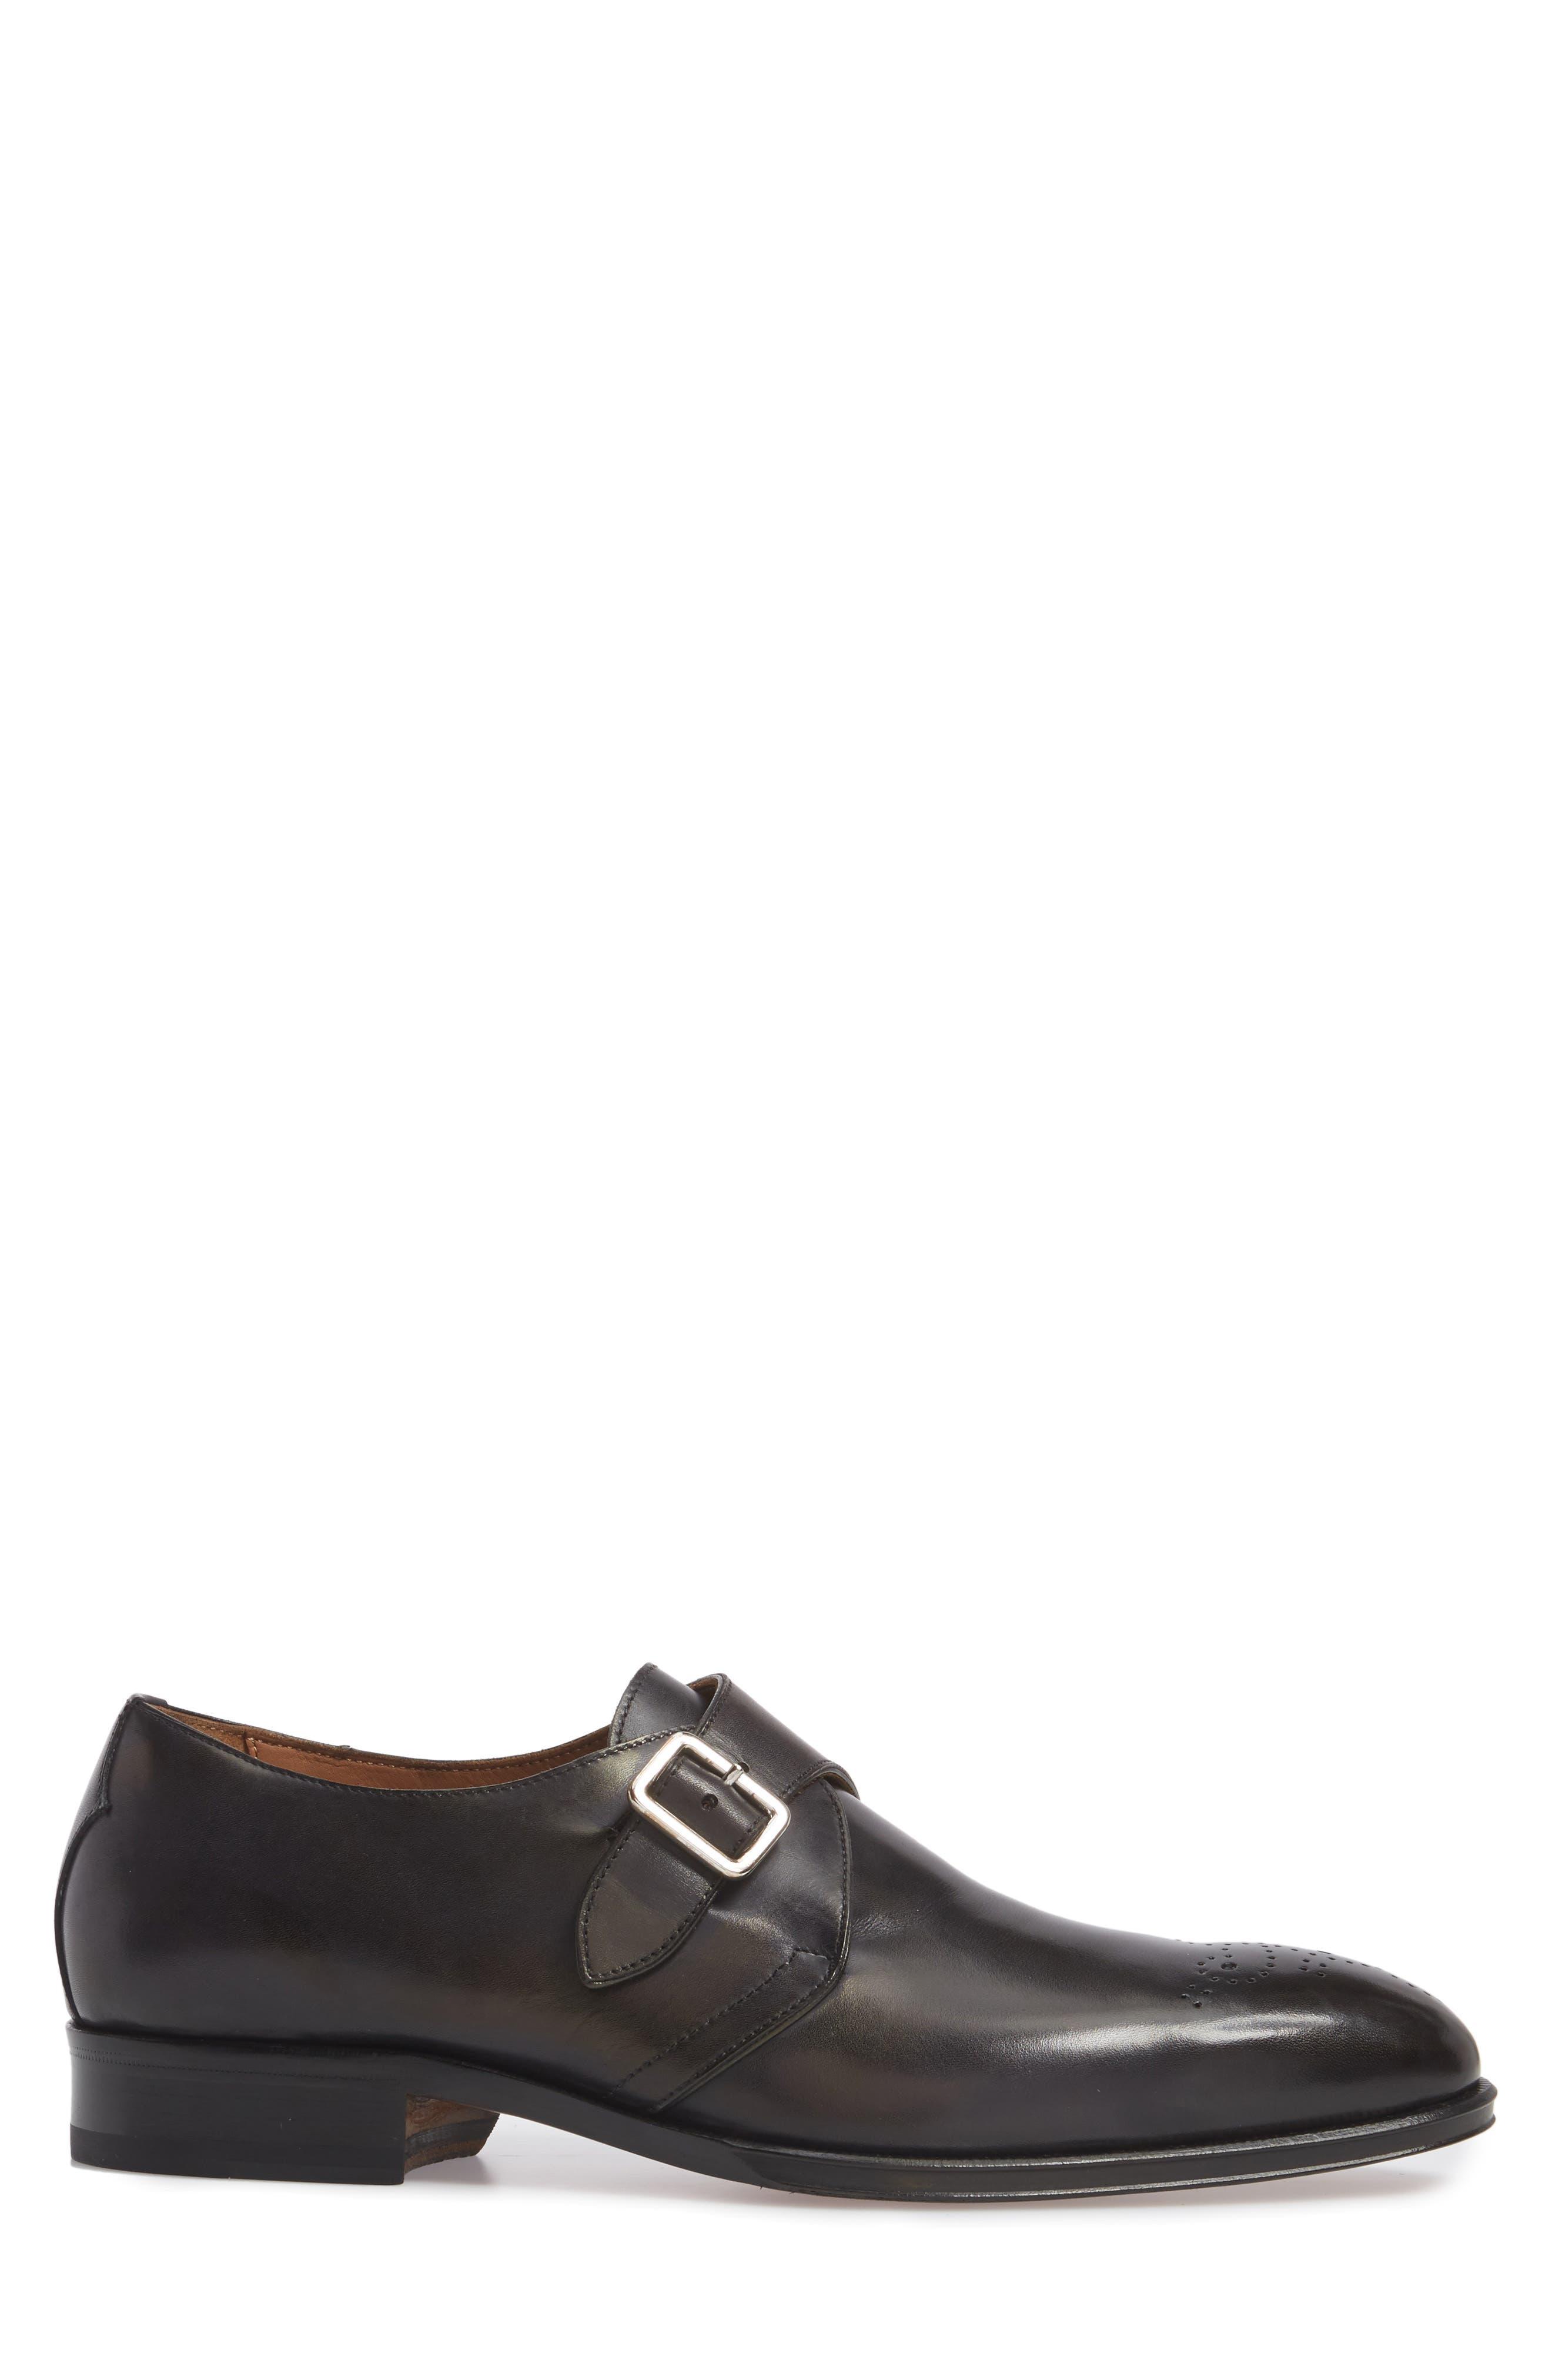 Gallo Bianco Bologna Monk Strap Shoe,                             Alternate thumbnail 3, color,                             Anthracite